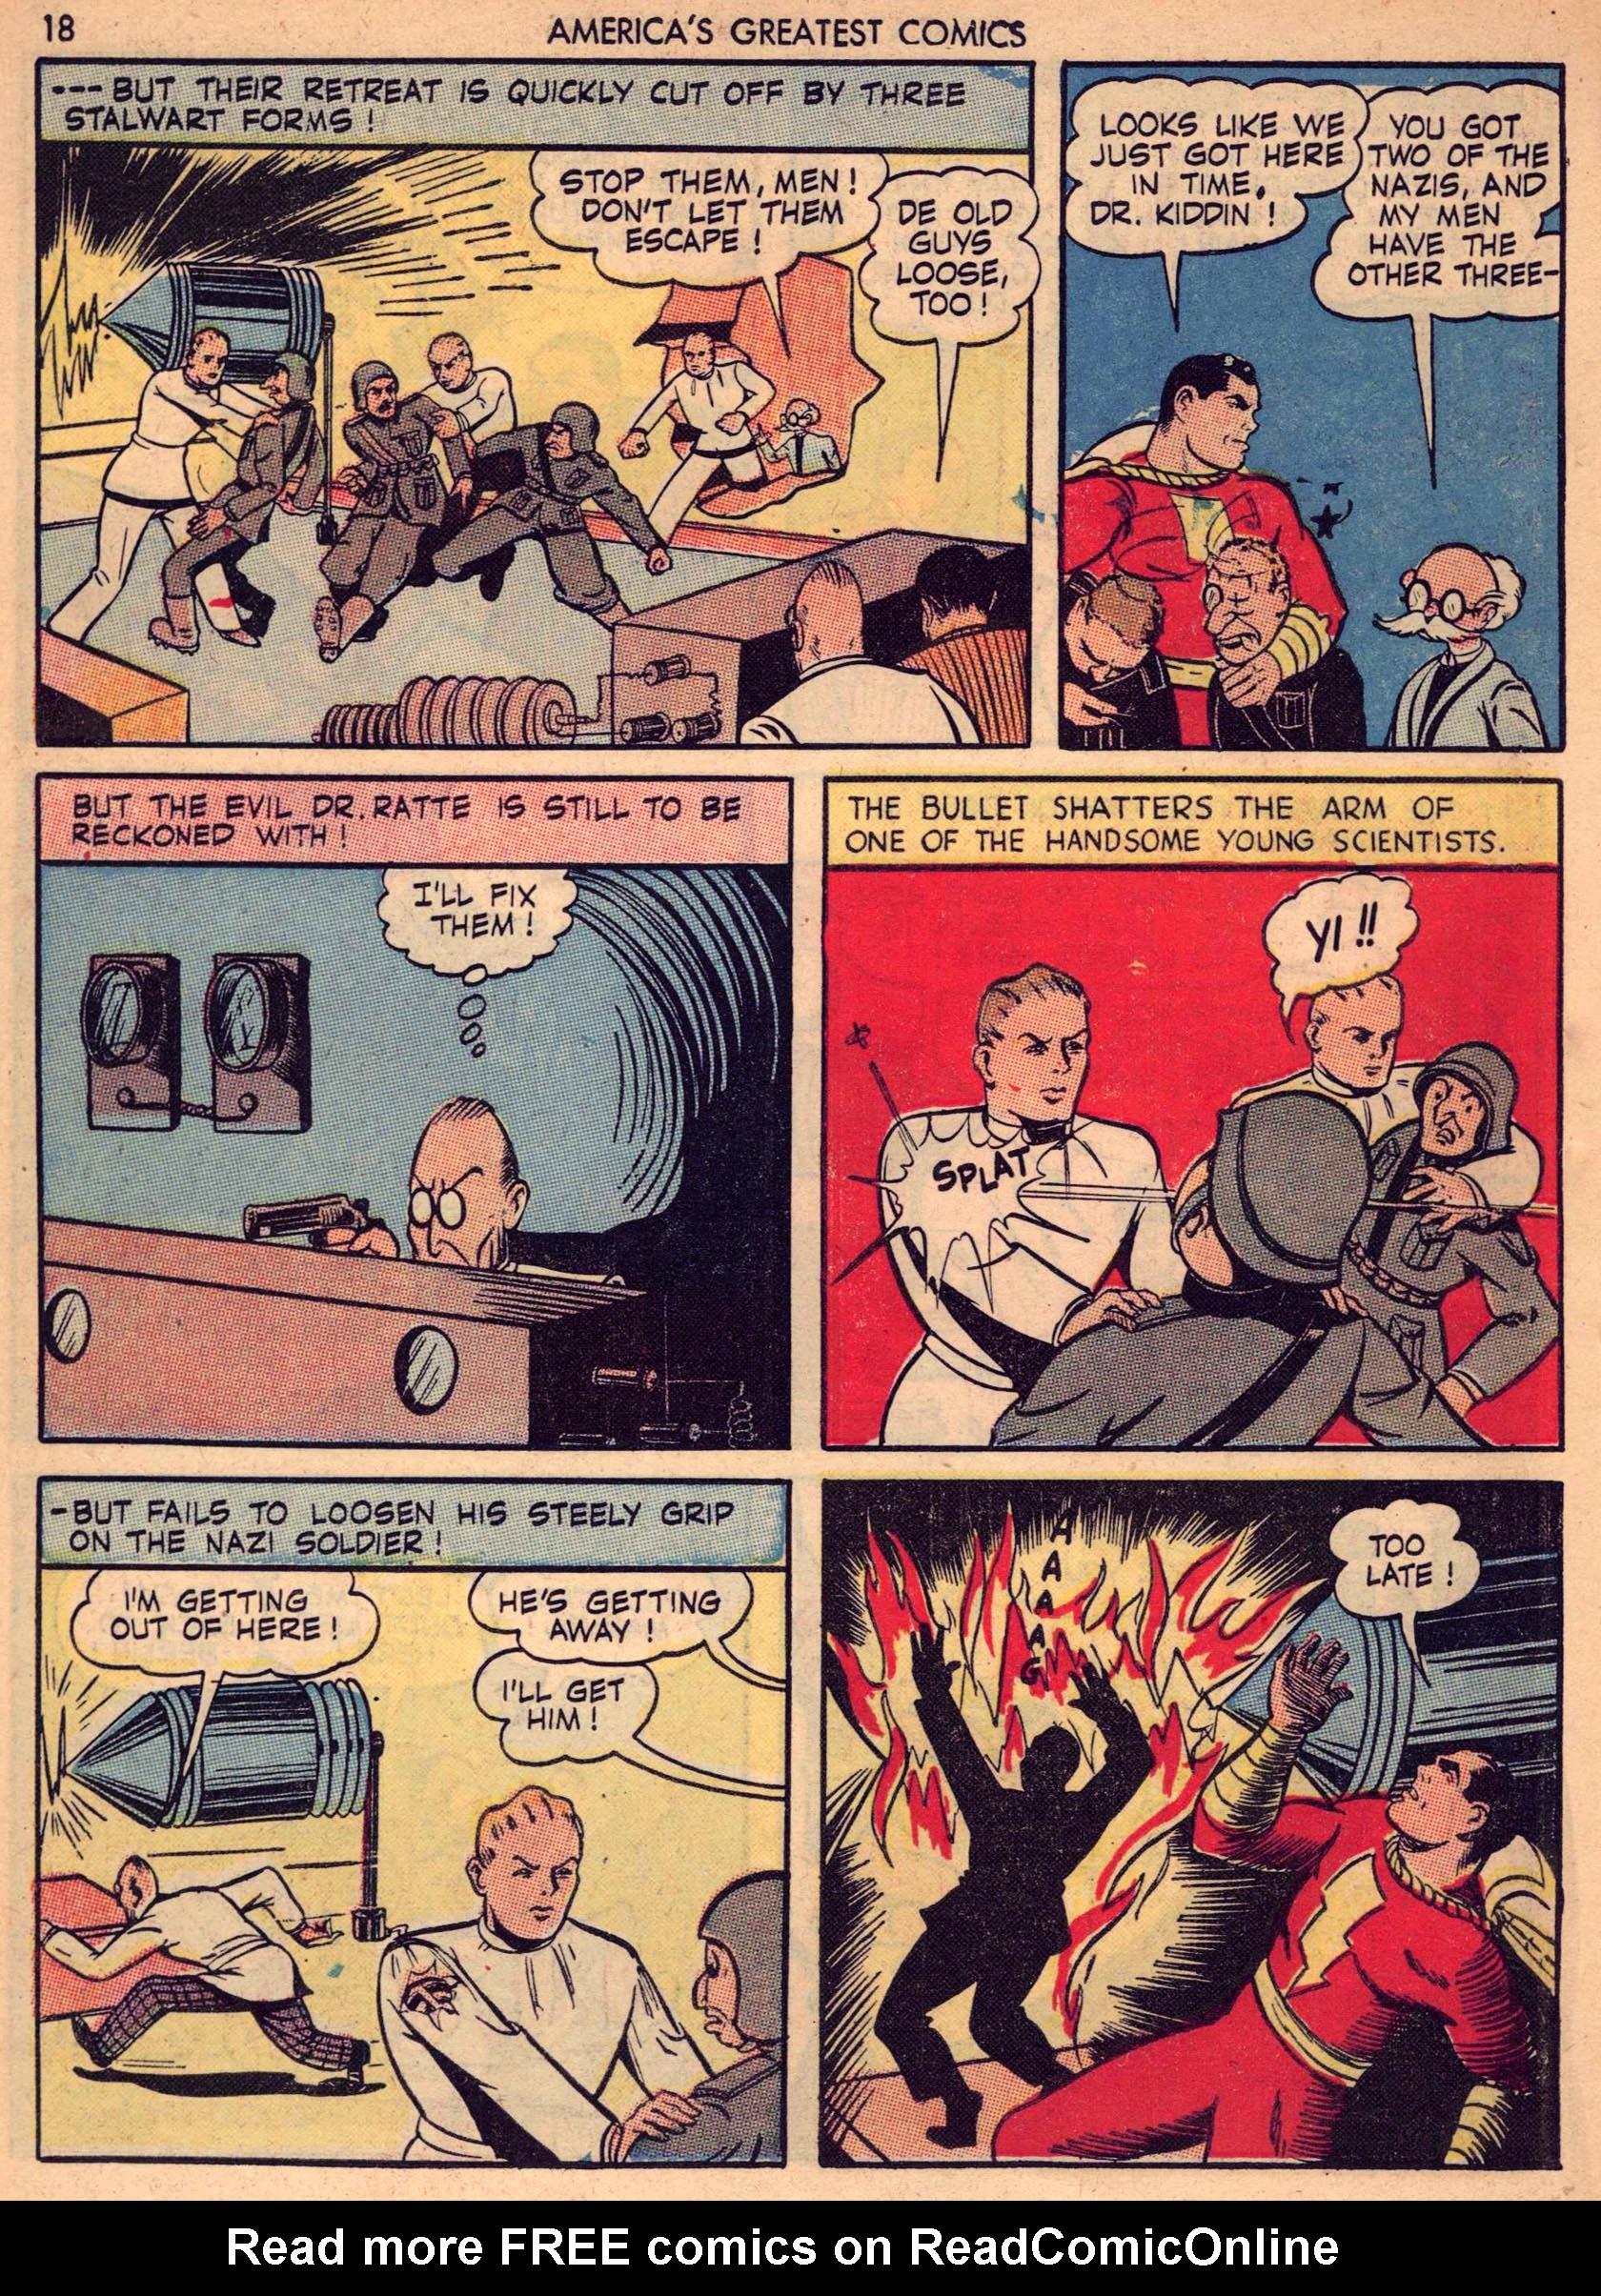 Read online America's Greatest Comics comic -  Issue #7 - 17